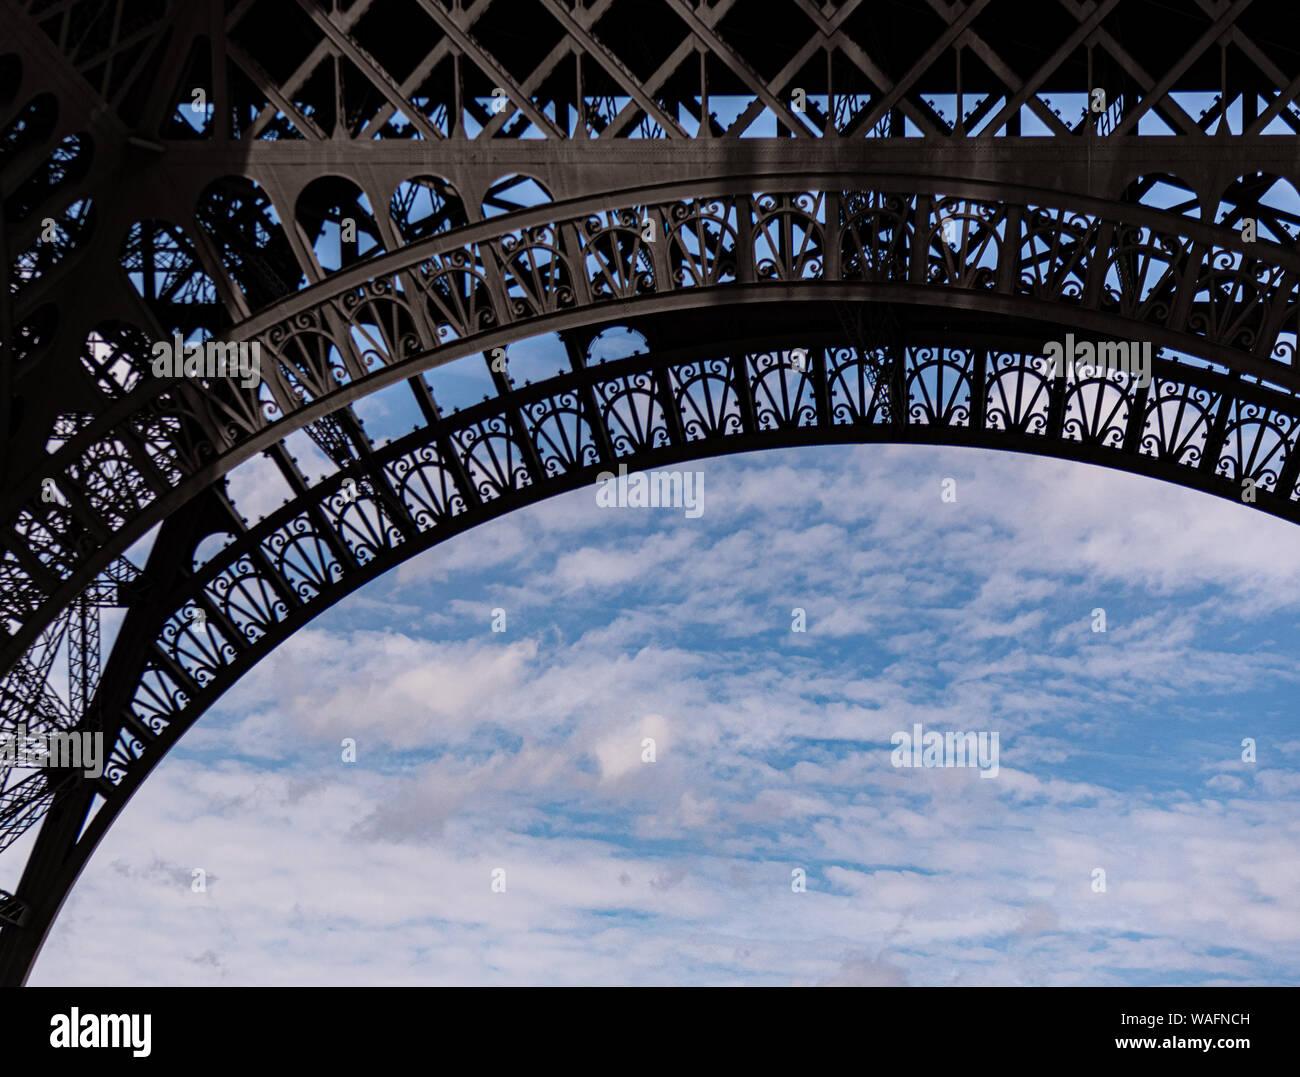 Eiffel Tower Paris France summer 2019 Stock Photo